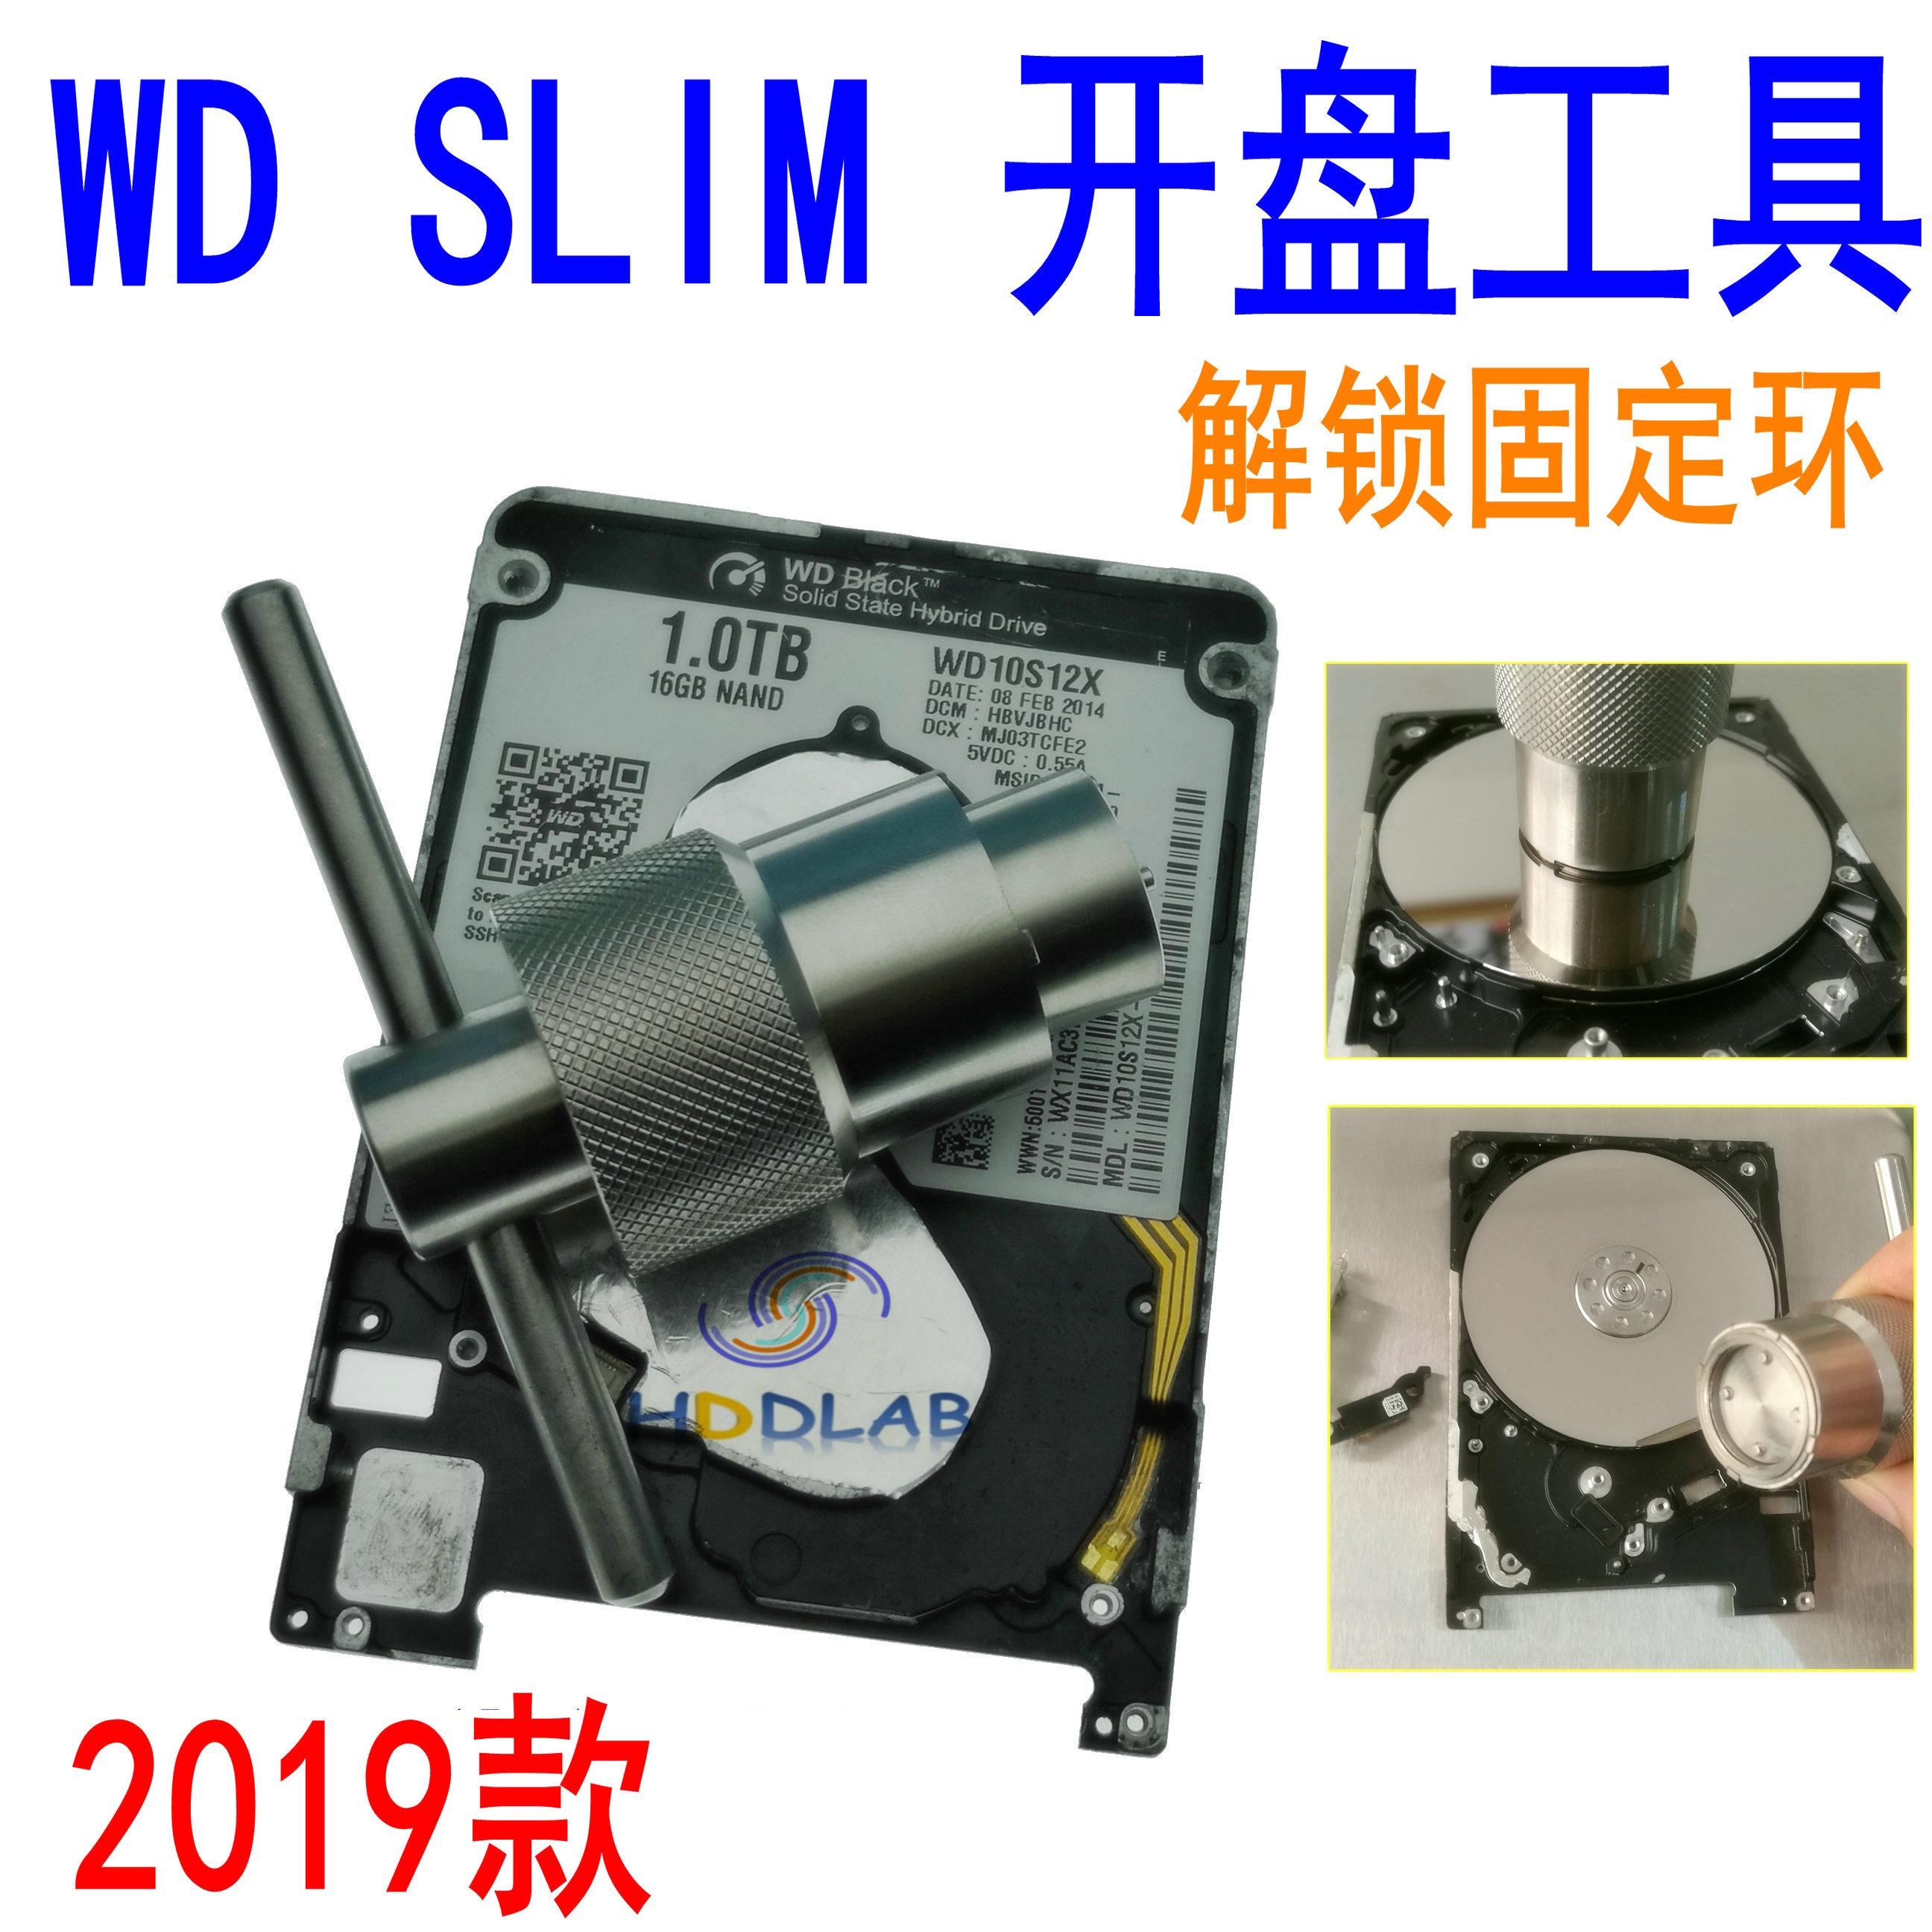 WDSLIM西数超薄盘开盘解锁工具拆电机更换盘片WD Slim Unlock Key